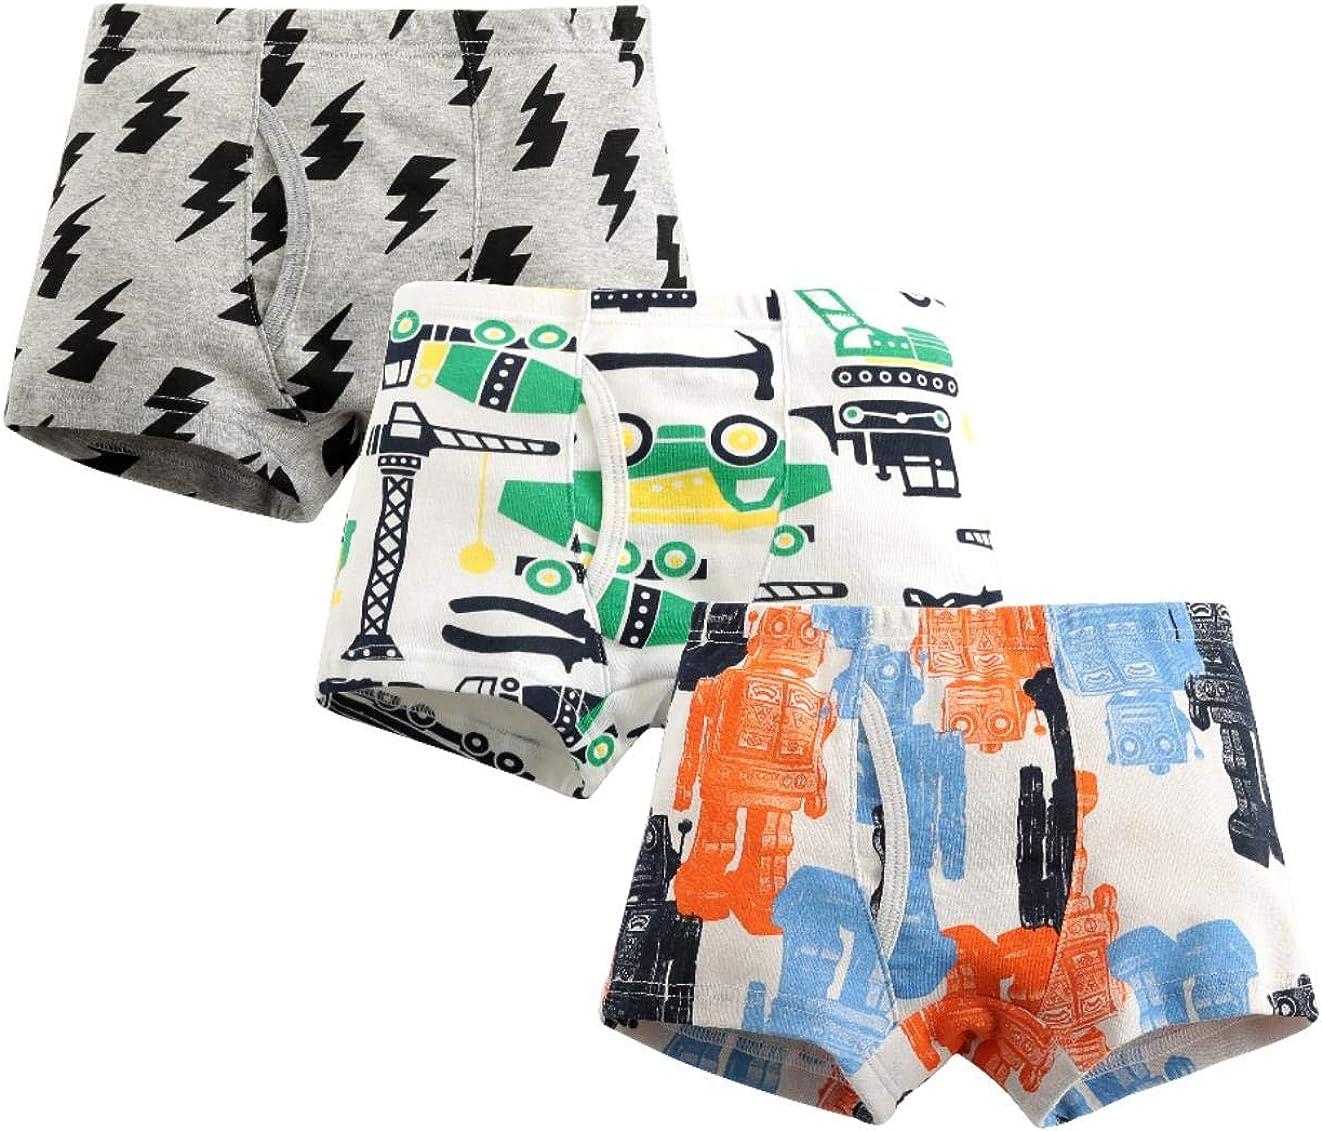 MIMY Boys Soft Cotton Boxer Briefs Toddler Kids Baby Underwear Dinosaur Truck Training Panty 3 Pack 3-10Y Pink